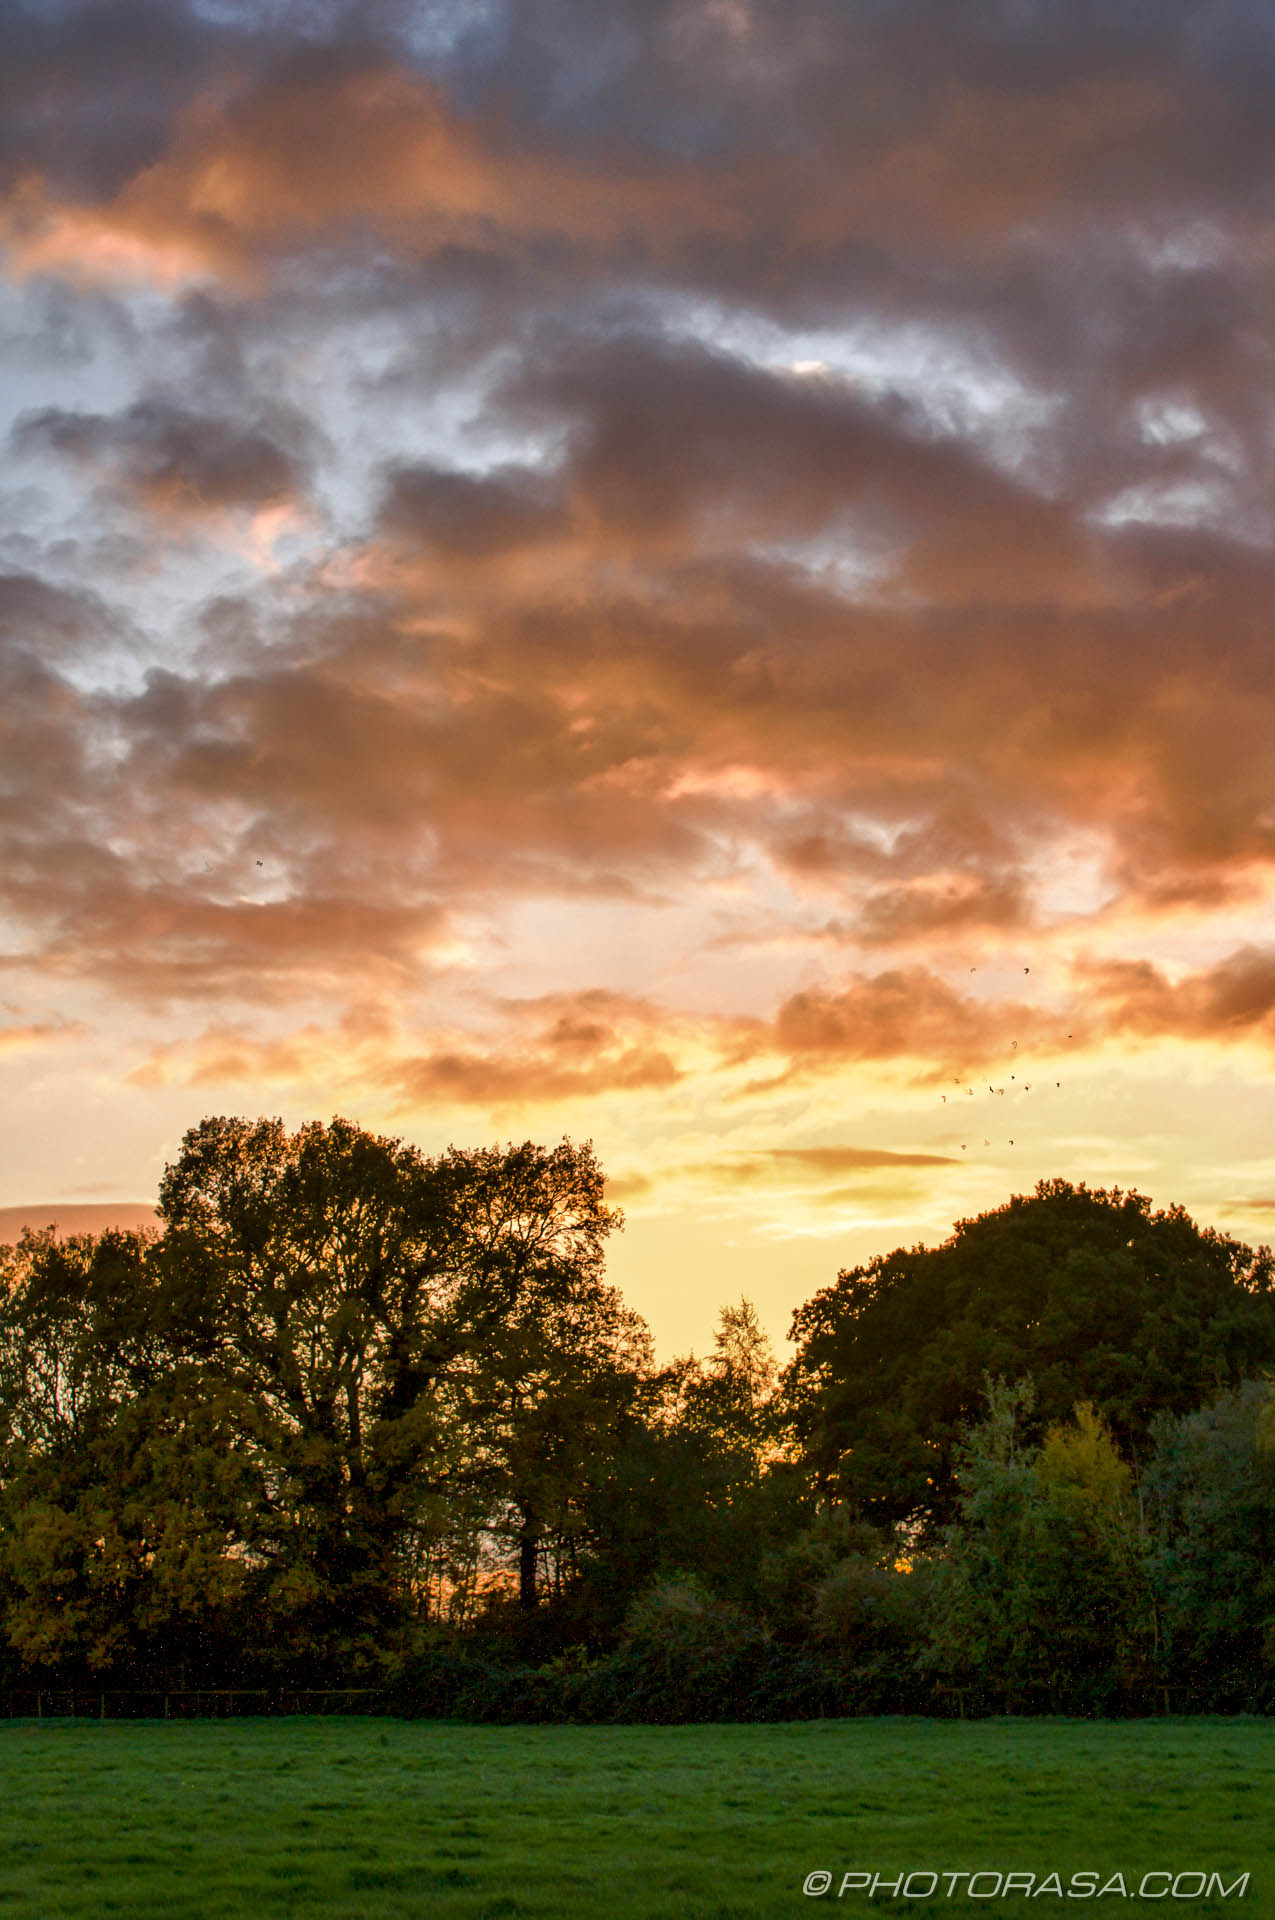 http://photorasa.com/november-evening-sky-farmers-fields/dark-clouds-lit-by-the-setting-sun/